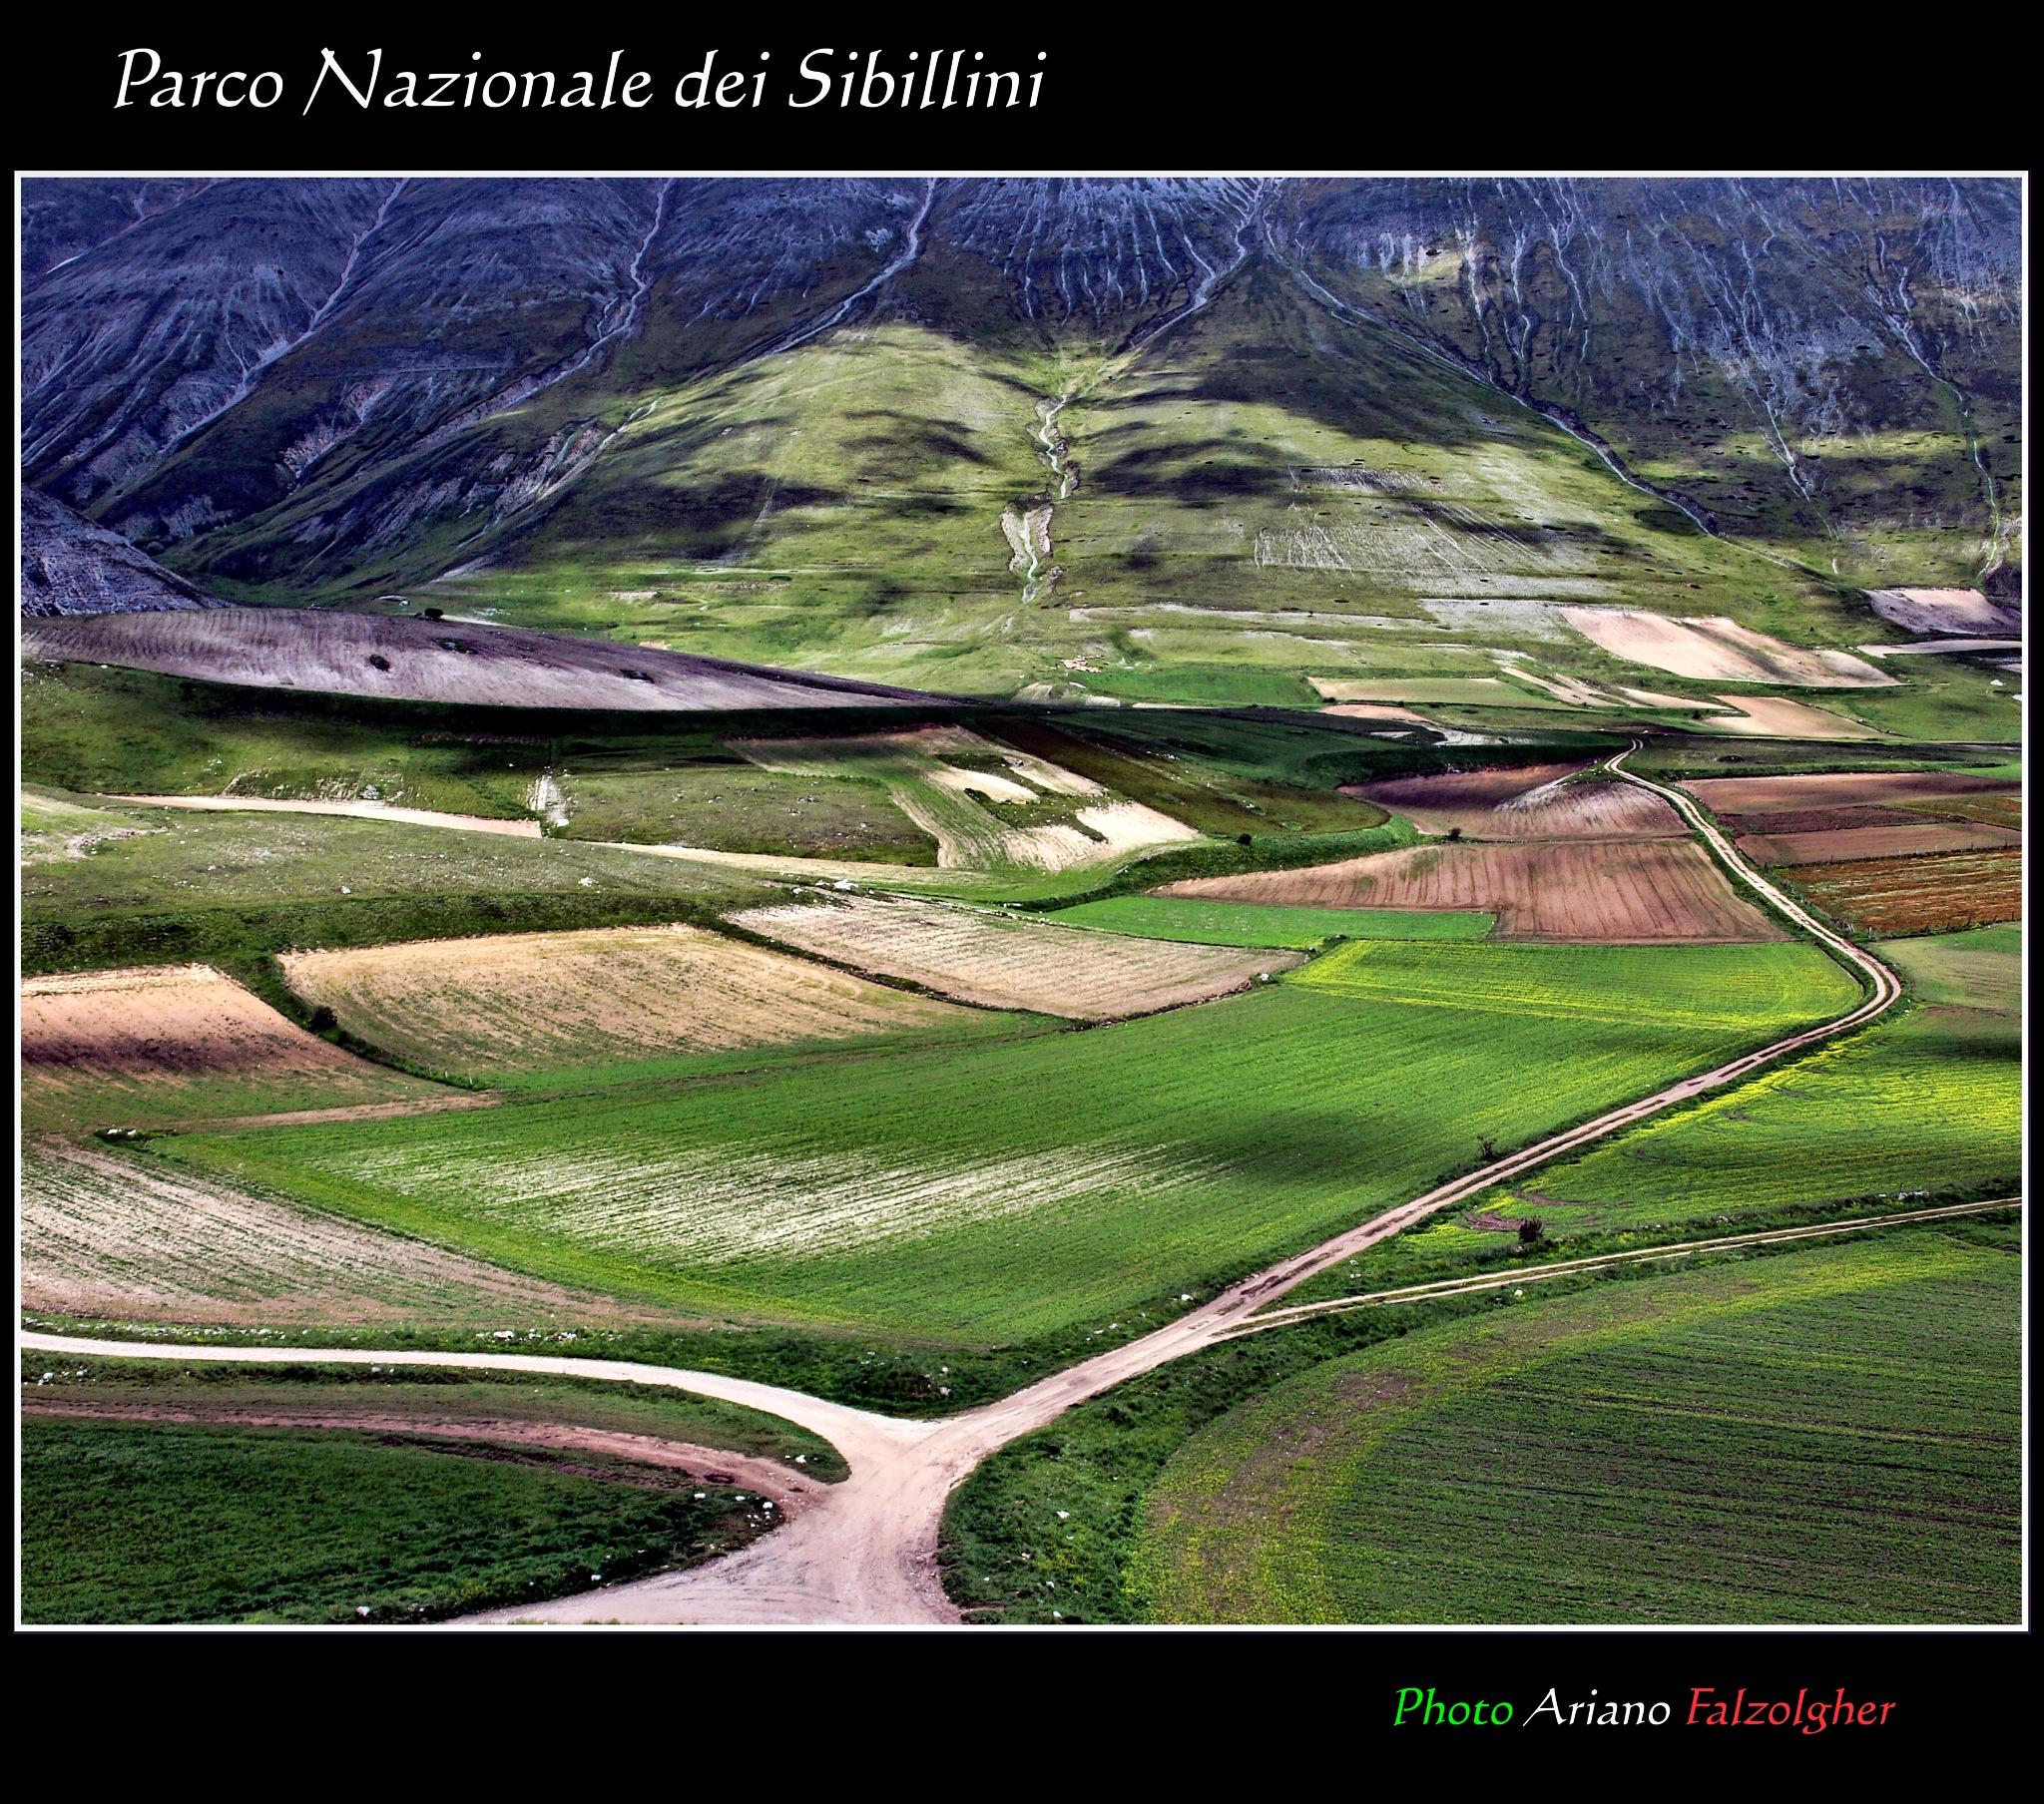 Parco Nazionale dei Sibillini by Ariano Falzolgher